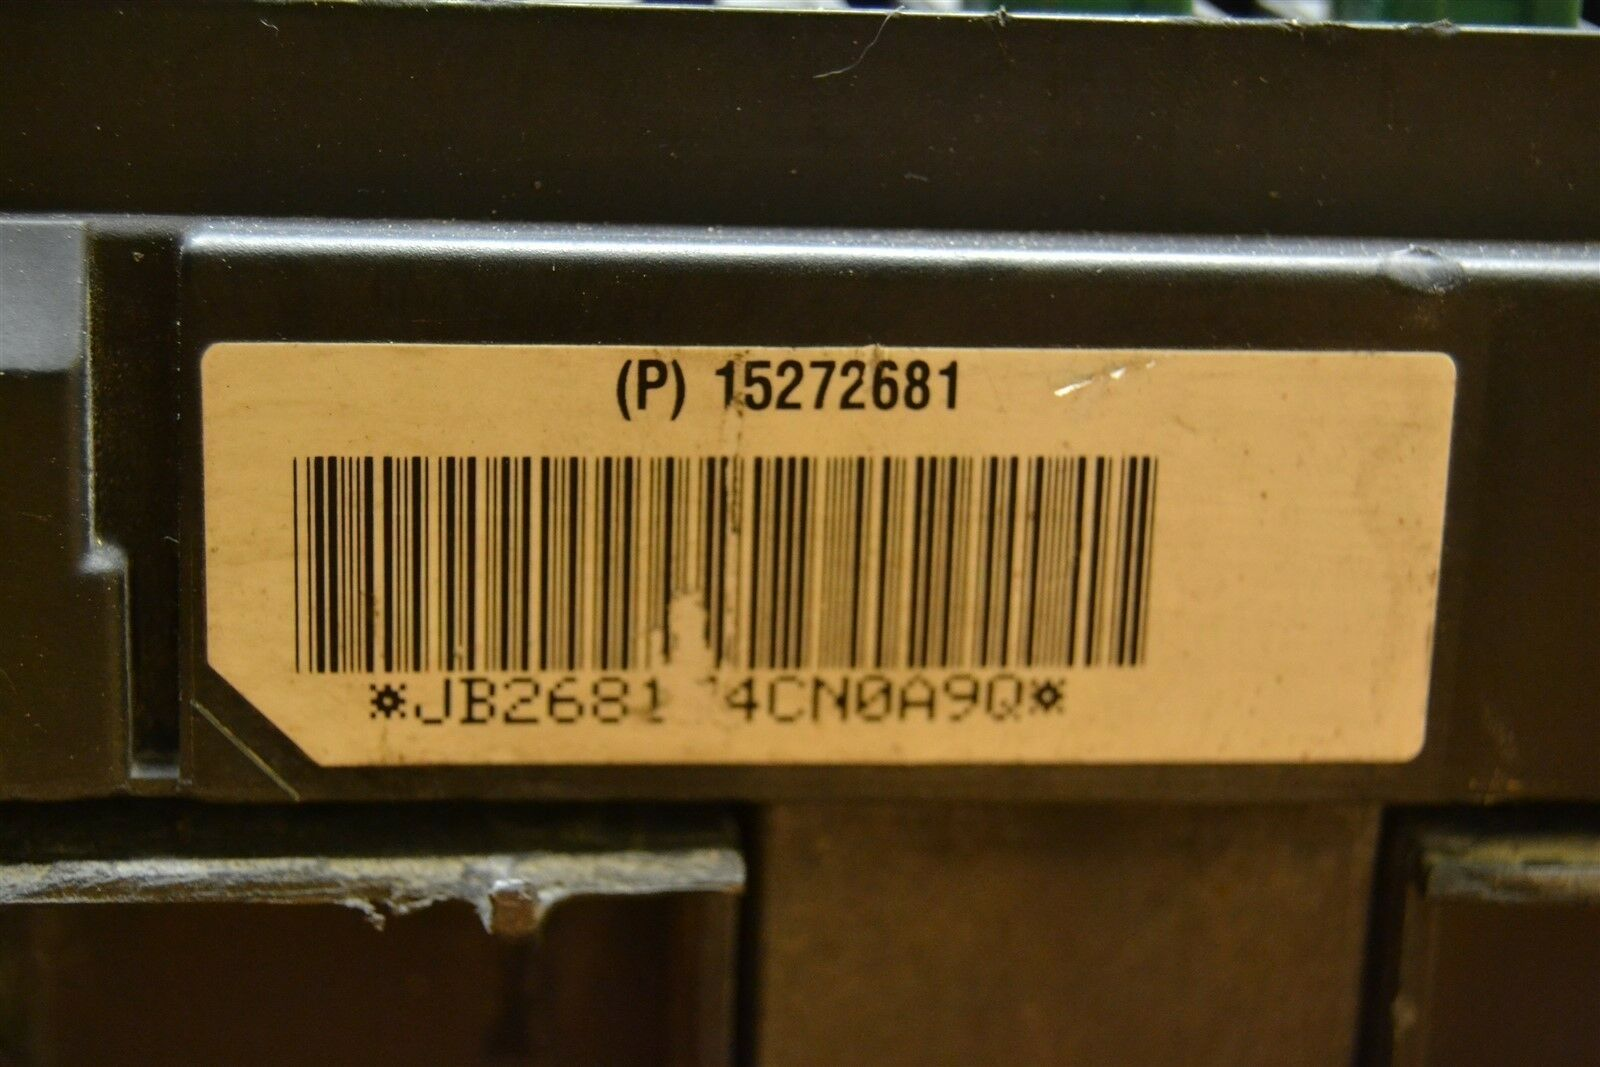 2005 chevrolet uplander fuse box relay unit 15272681 module 2010 14c5